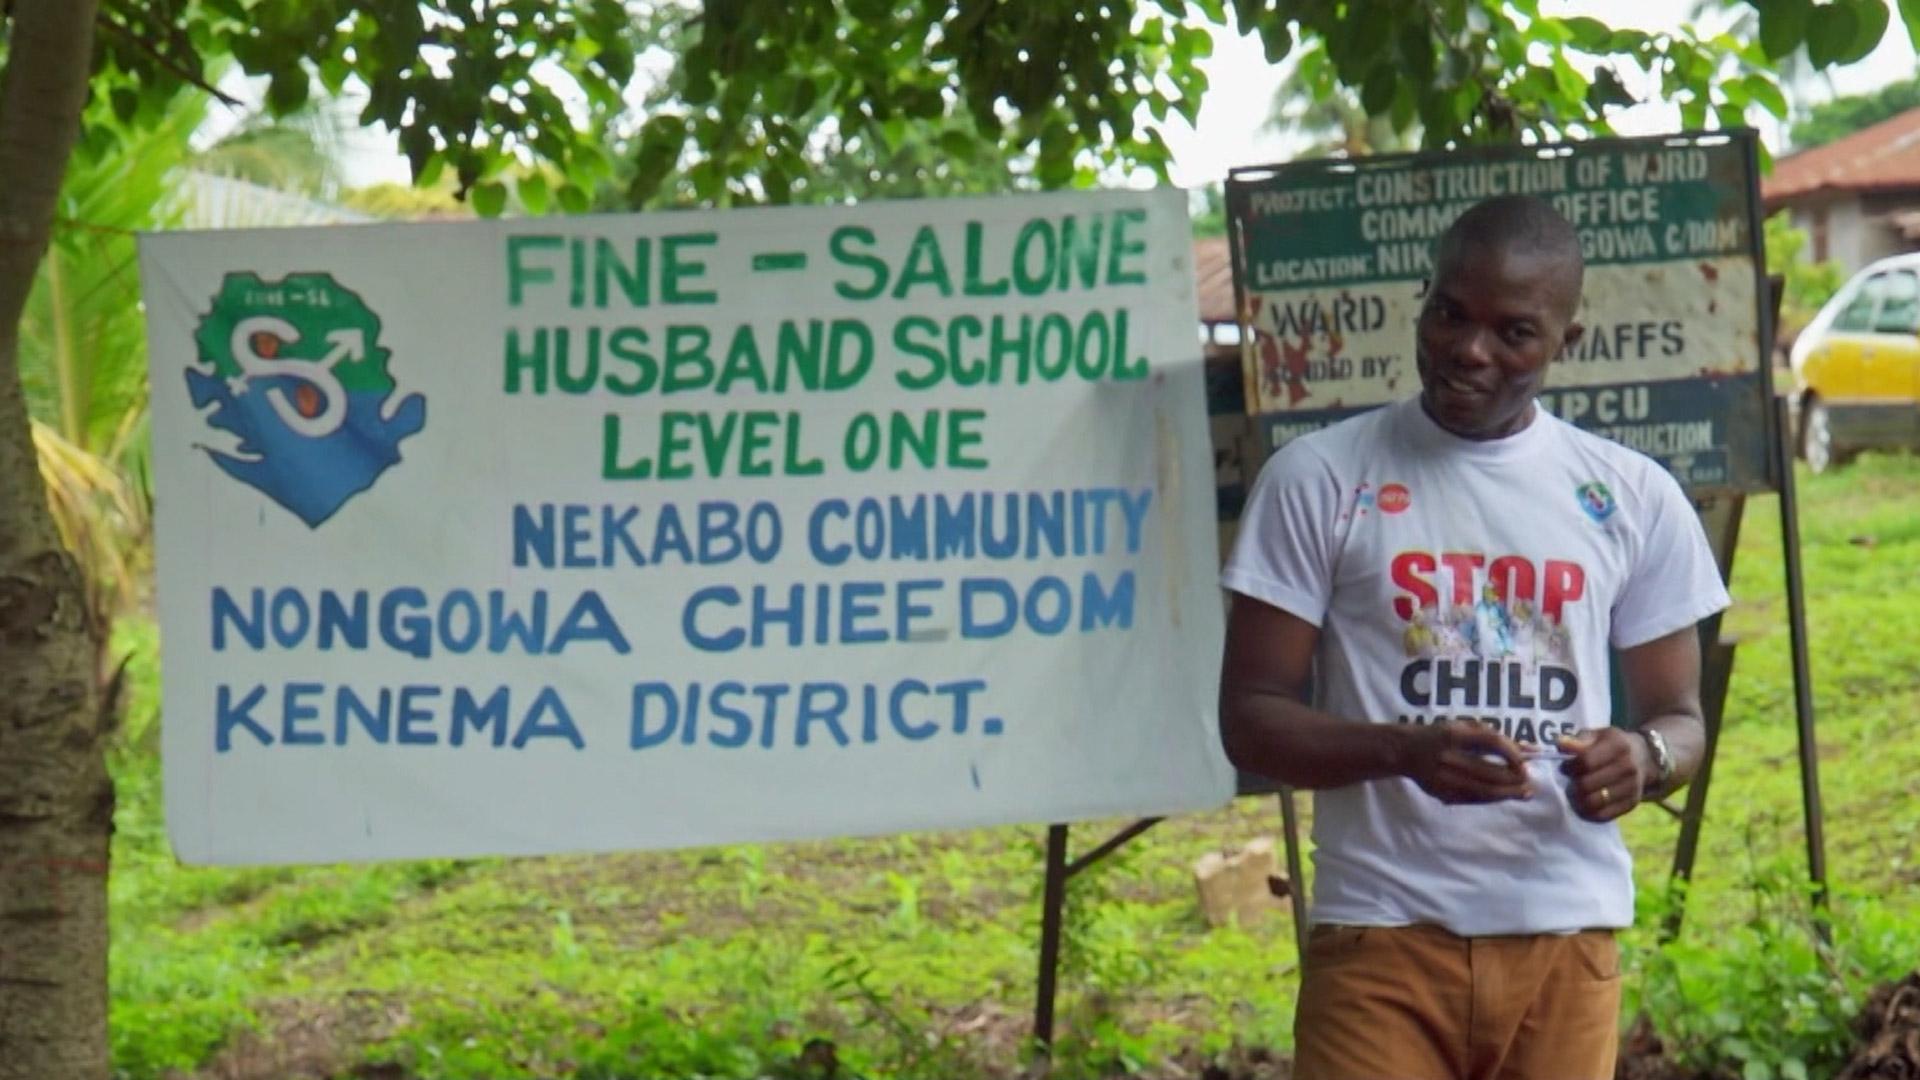 S1 E24: The Husband School